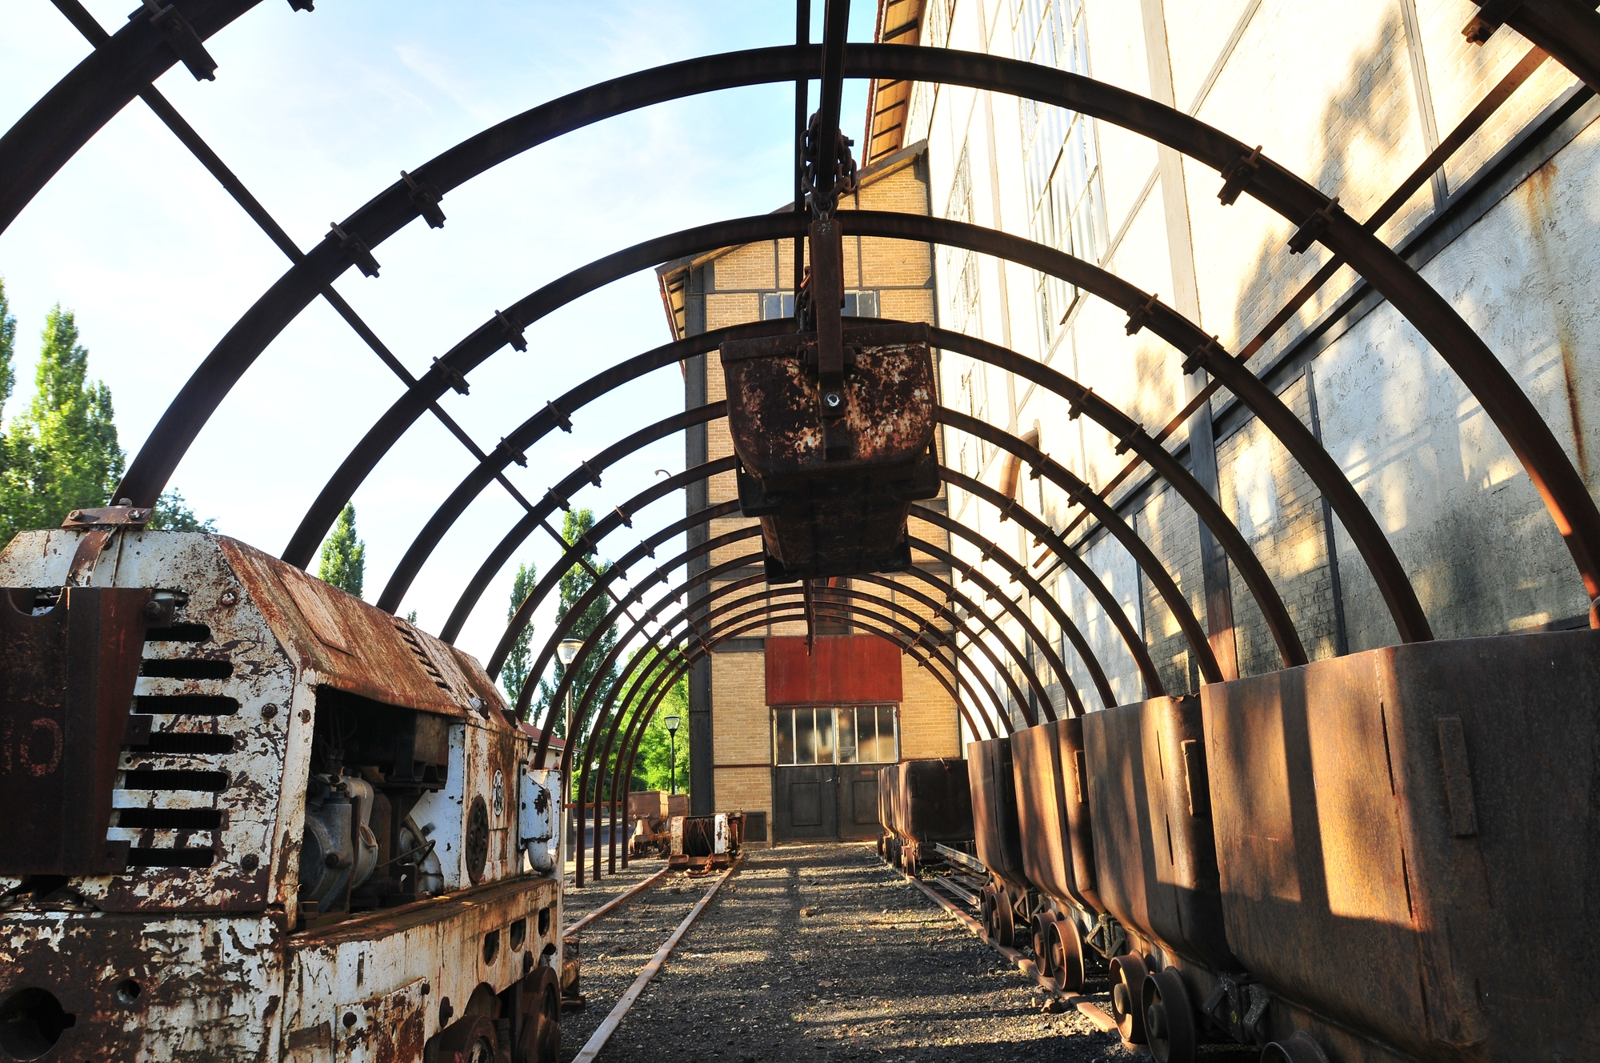 Musée de la mine, Brassac-les-mines